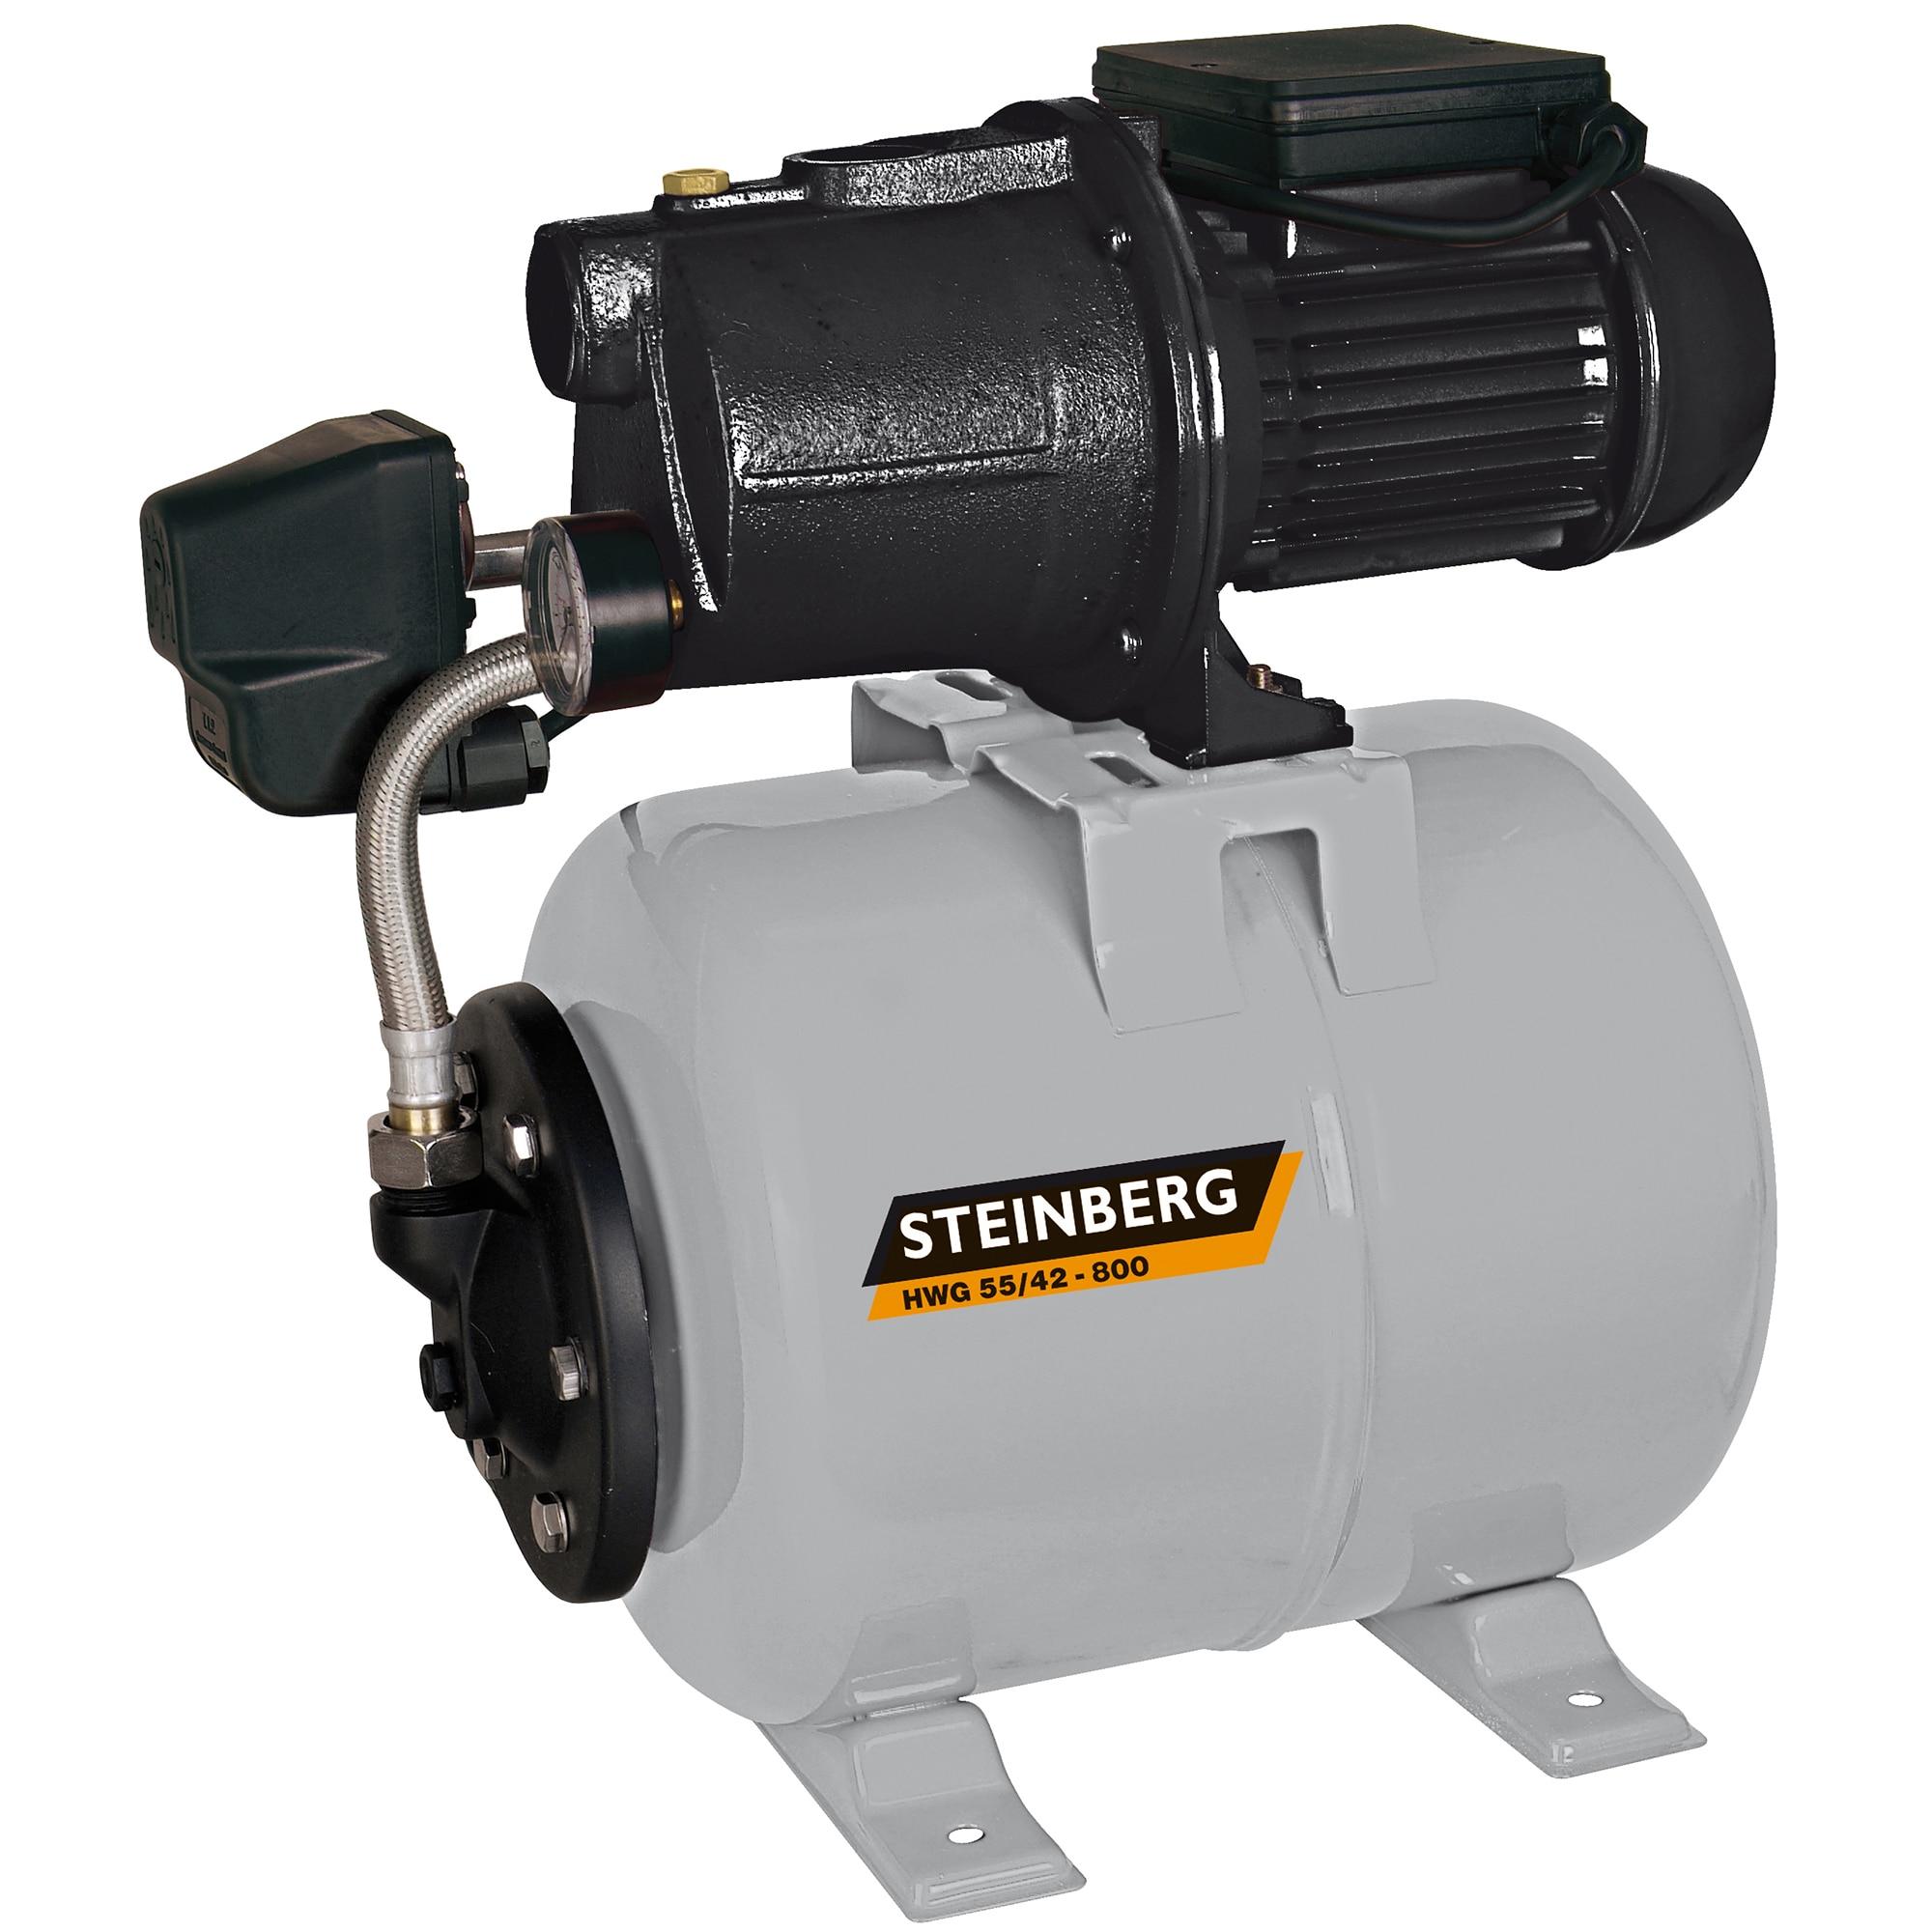 Fotografie Hidrofor Steinberg HWG 55/42-800, 800W, 22L, debit max. 3.300l/h, 4,2 bar